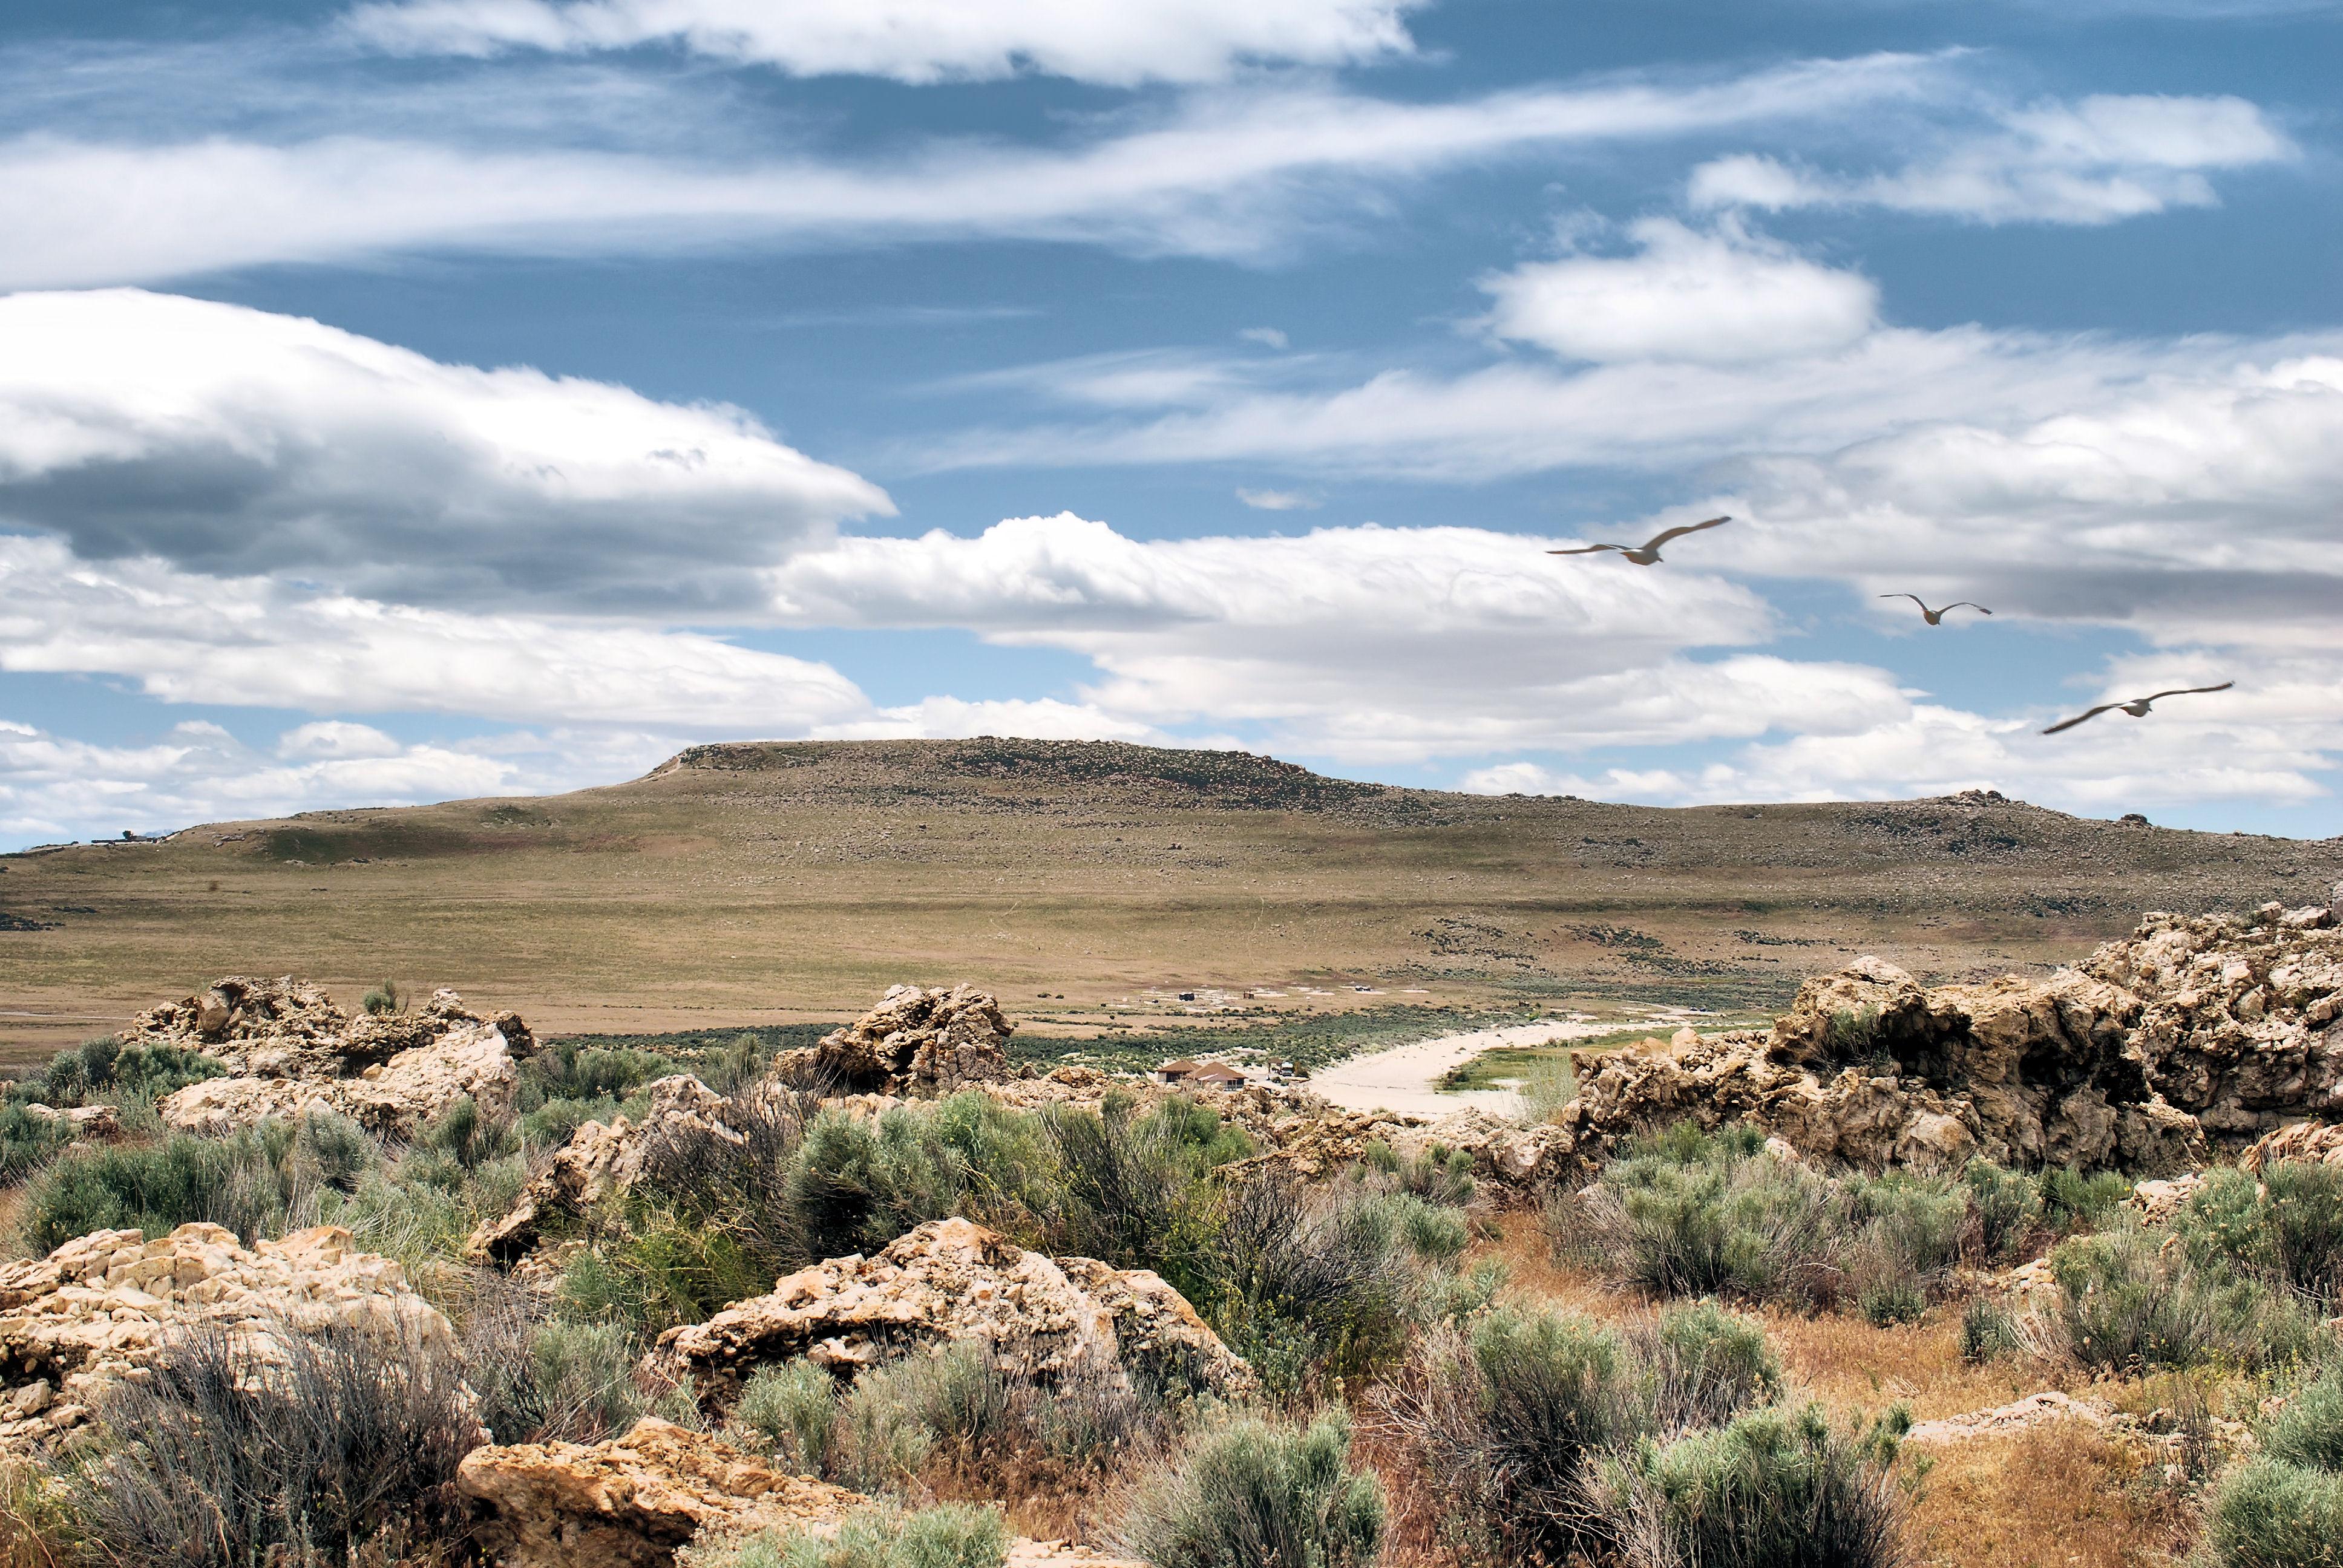 Antelope Sky, Antelope, Clouds, Desert, Island, HQ Photo